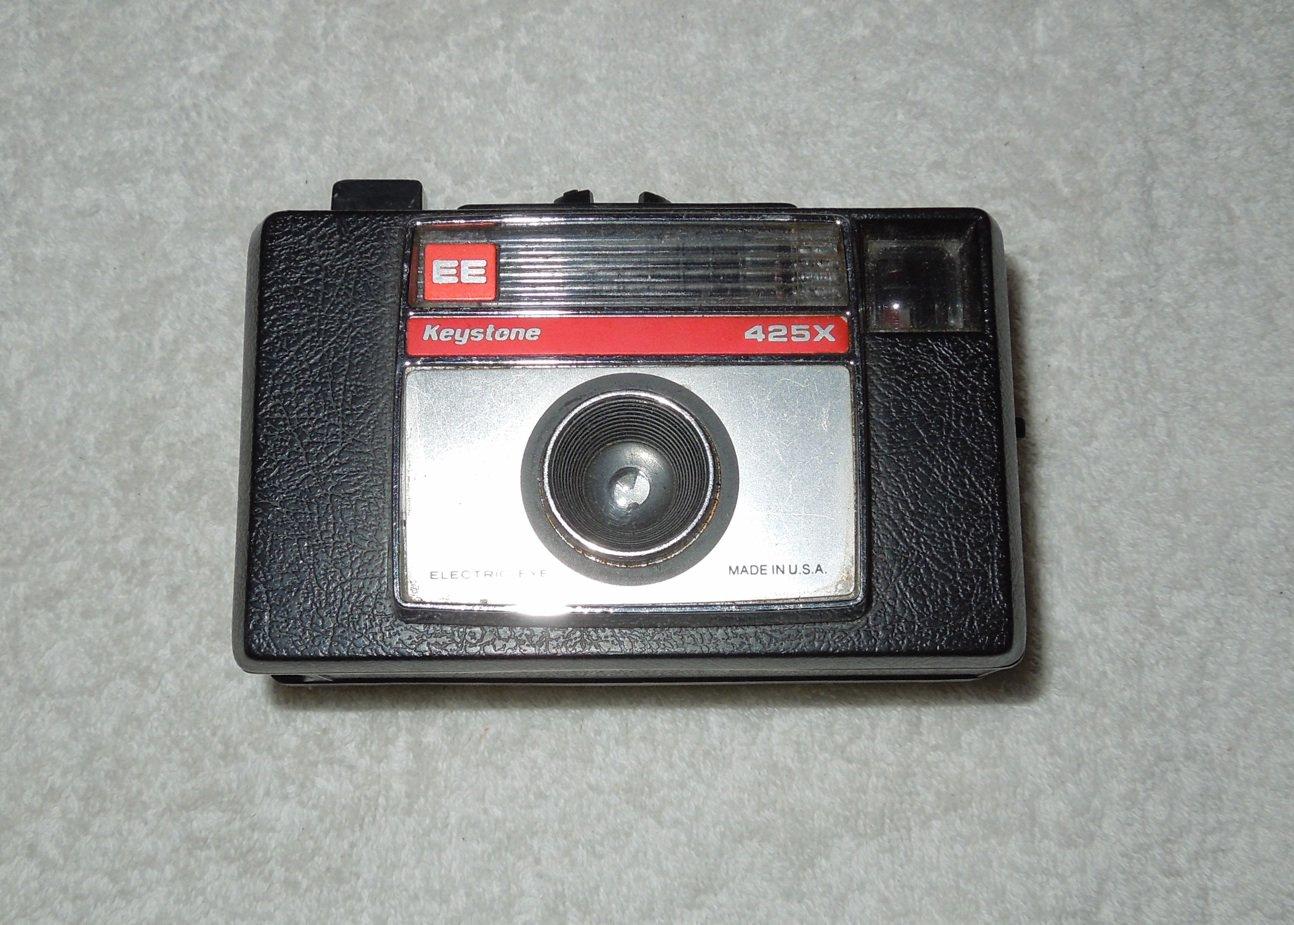 Keystone - 425X EE Electric Eye Camera - 126 Film - Needs To Be Cleaned